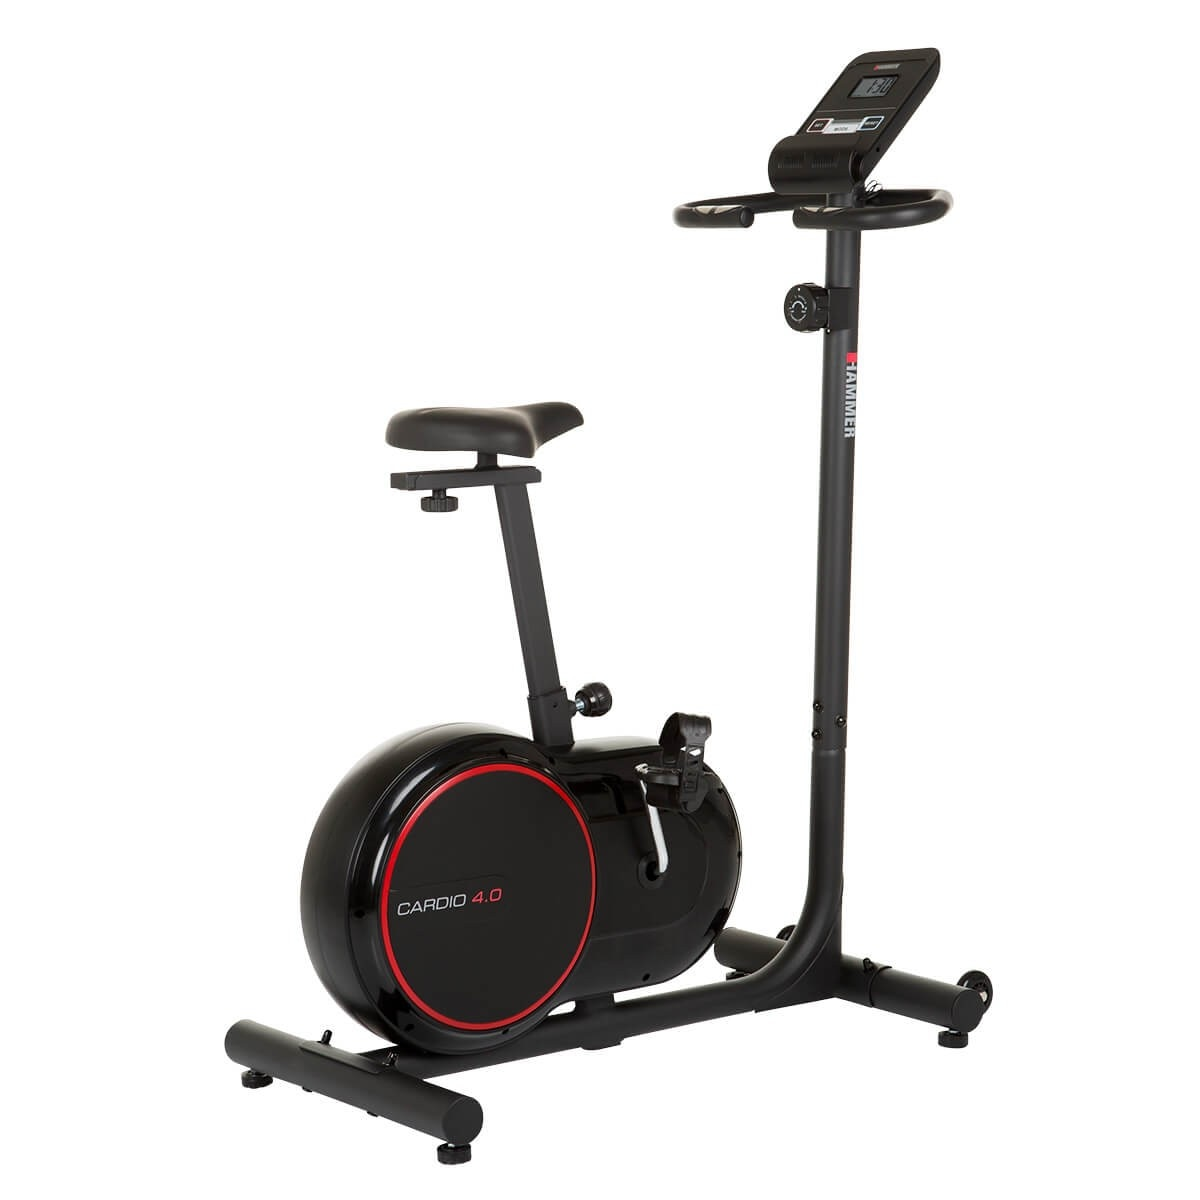 Fotografie Bicicleta fitness Hammer Cardio 4.0, volant 6kg, greutate maxima utilizator 110 kg